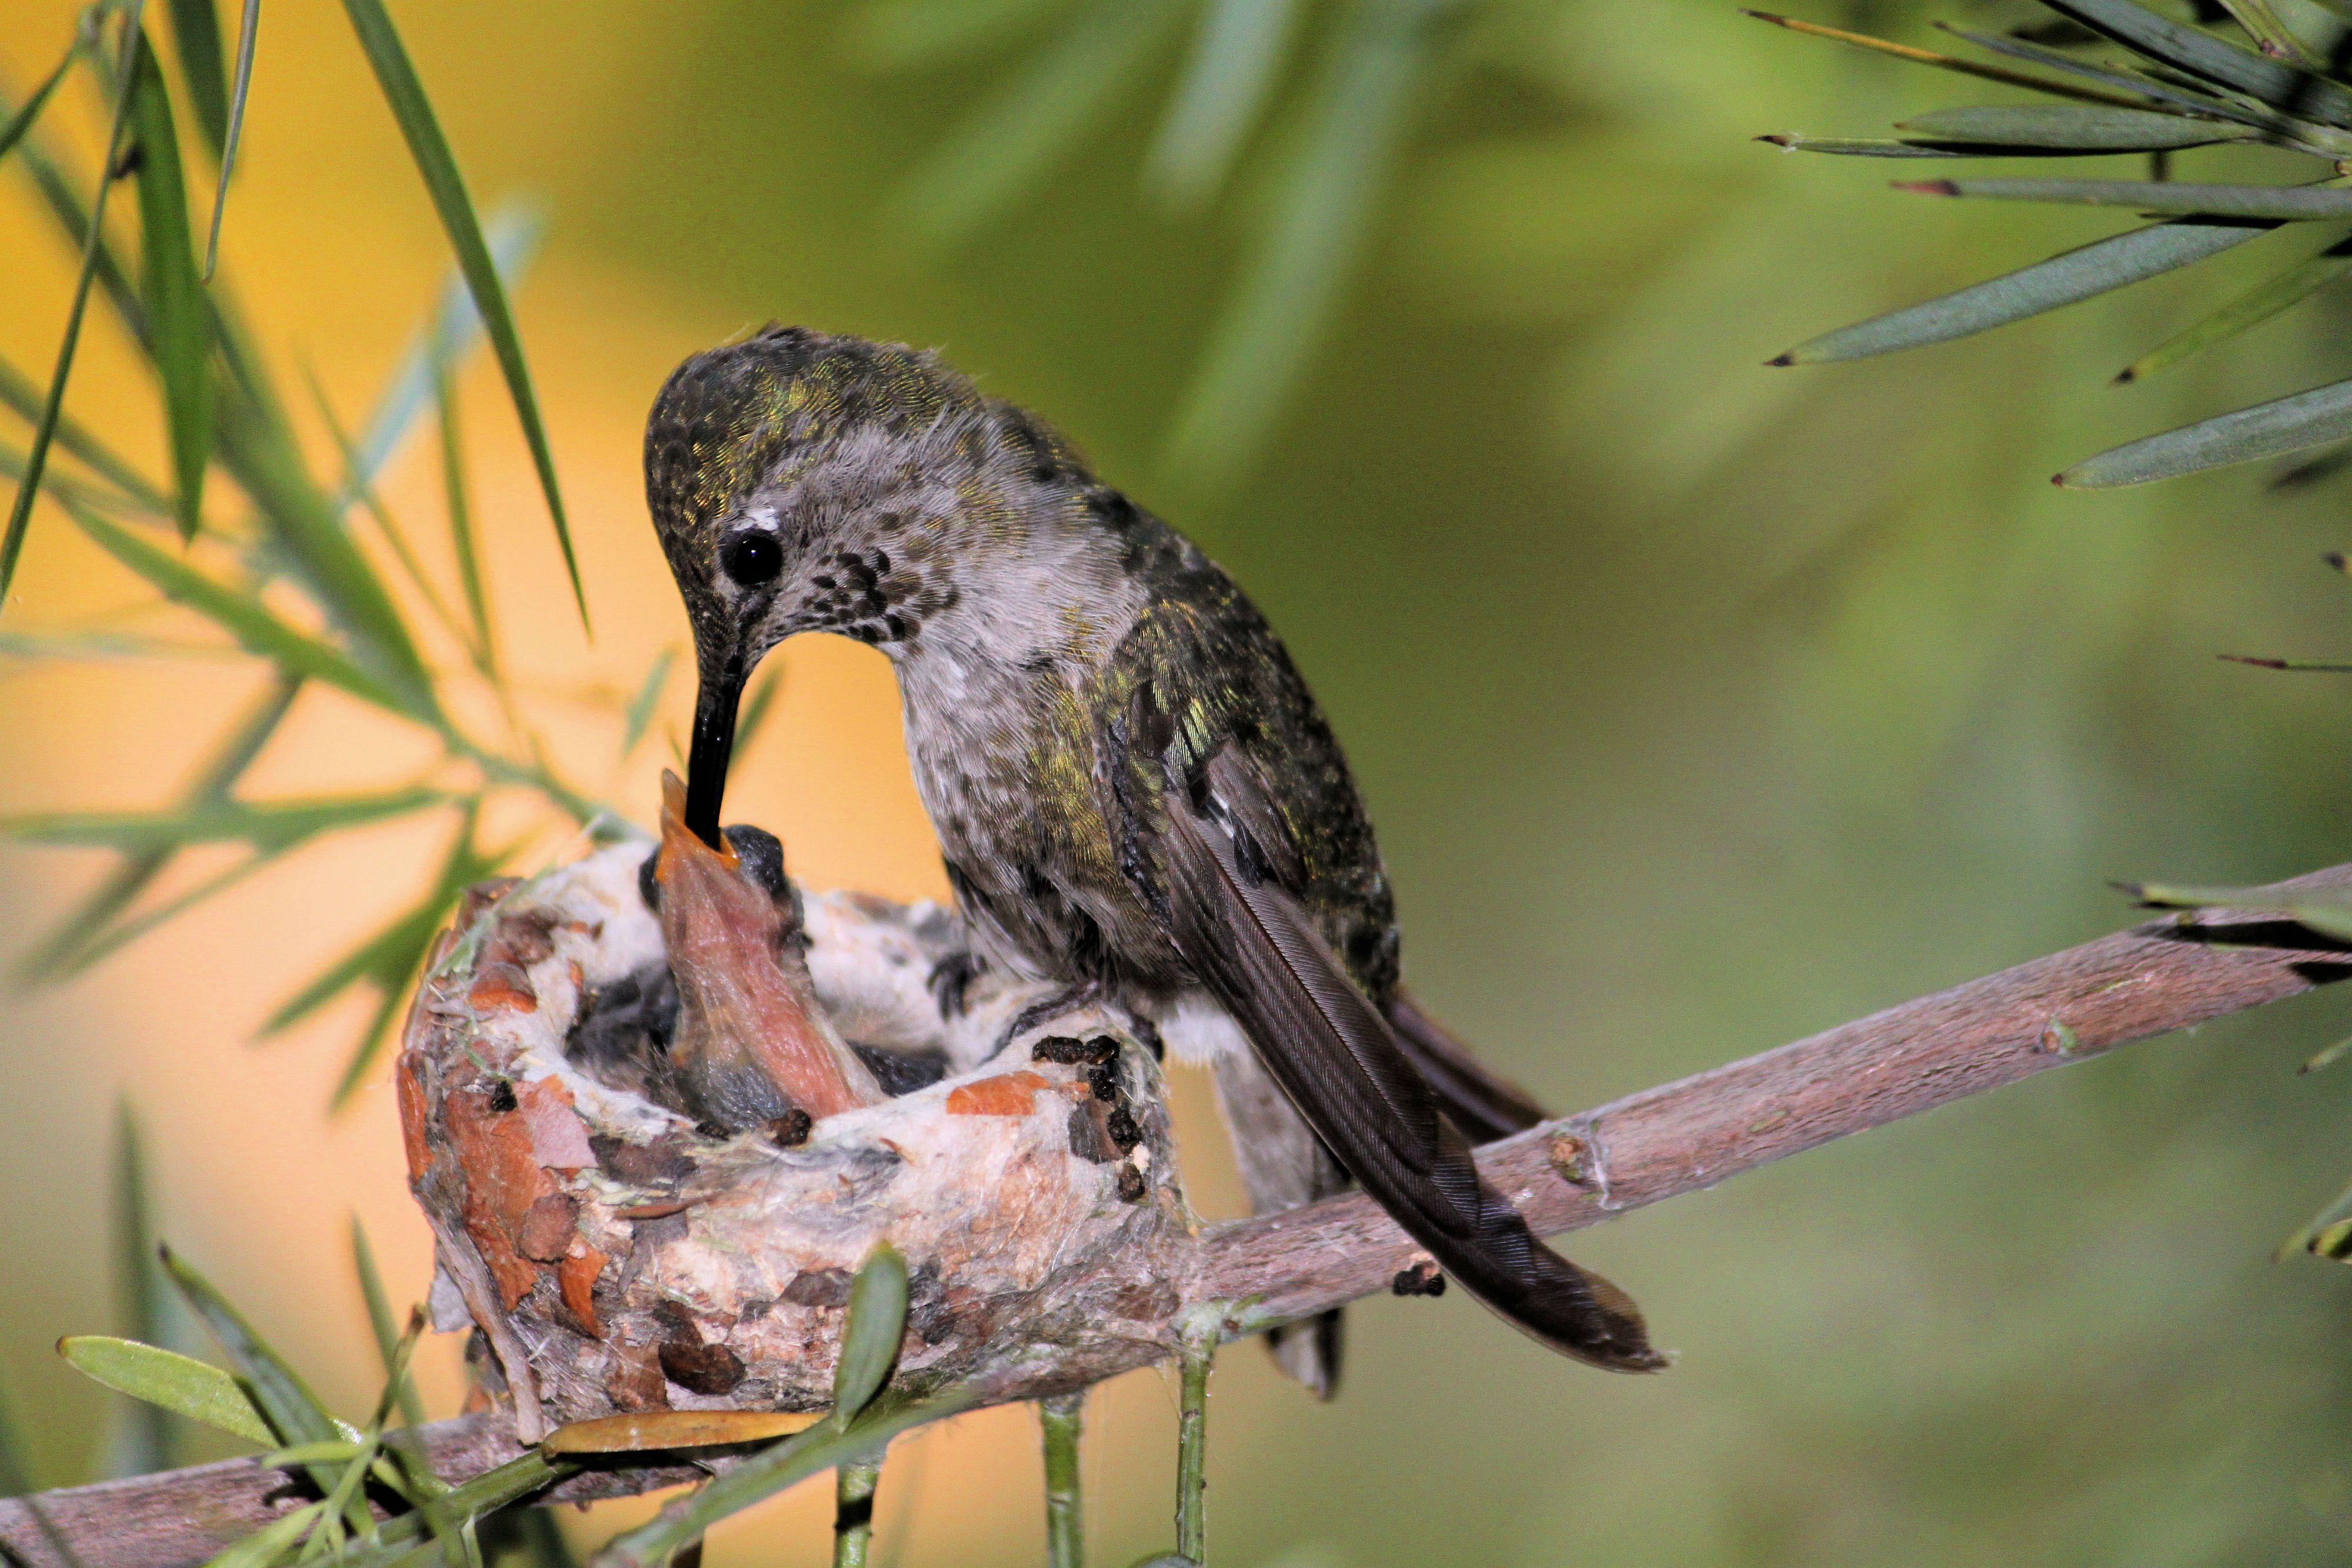 Anna's hummingbird in a nest